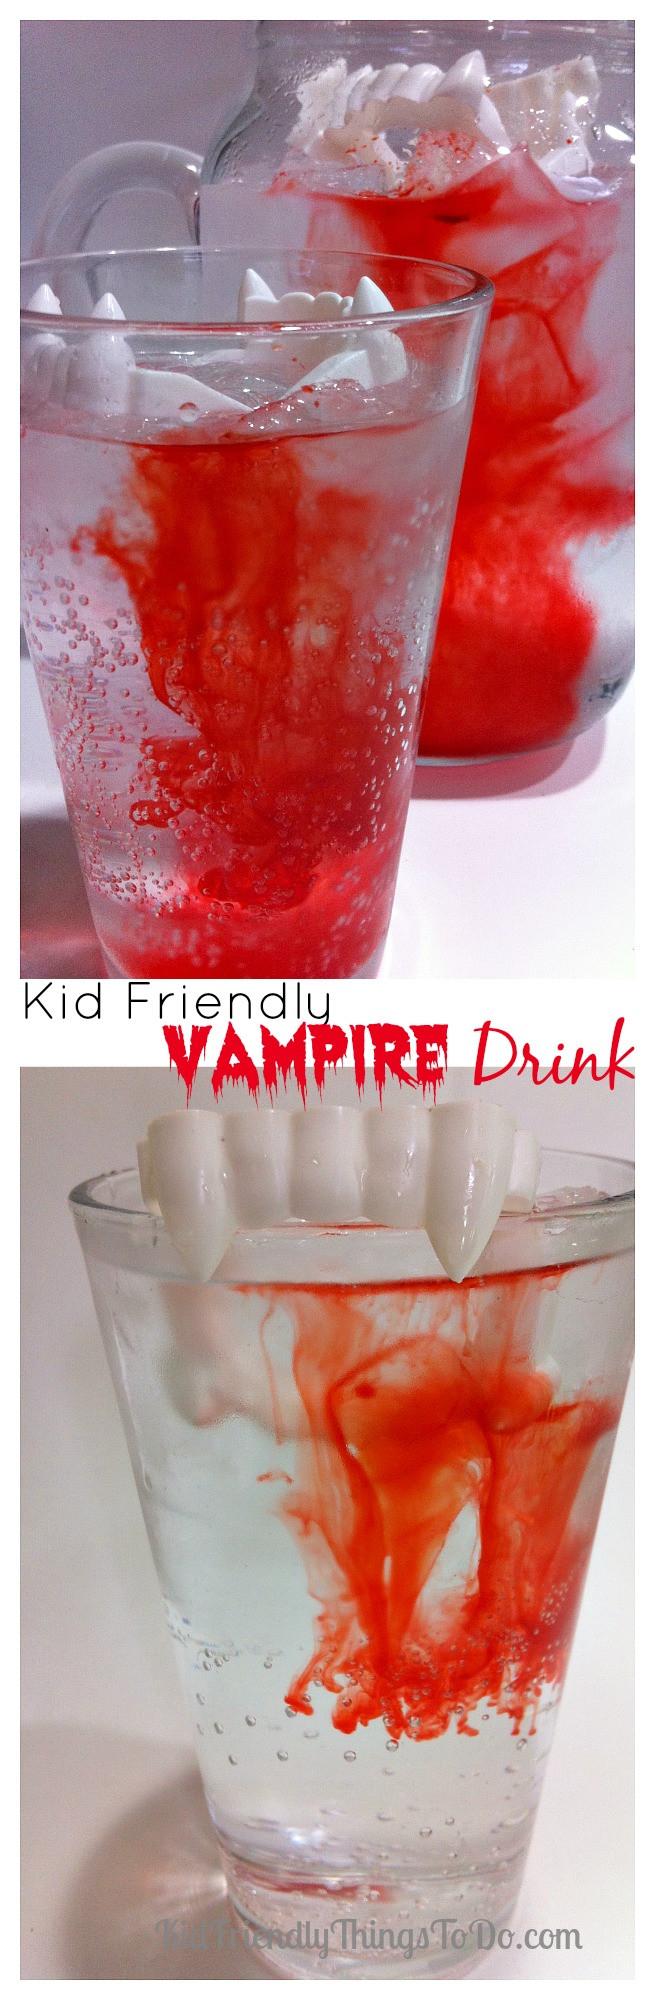 Halloween Foods And Drinks  Kid Friendly Halloween Vampire Drink